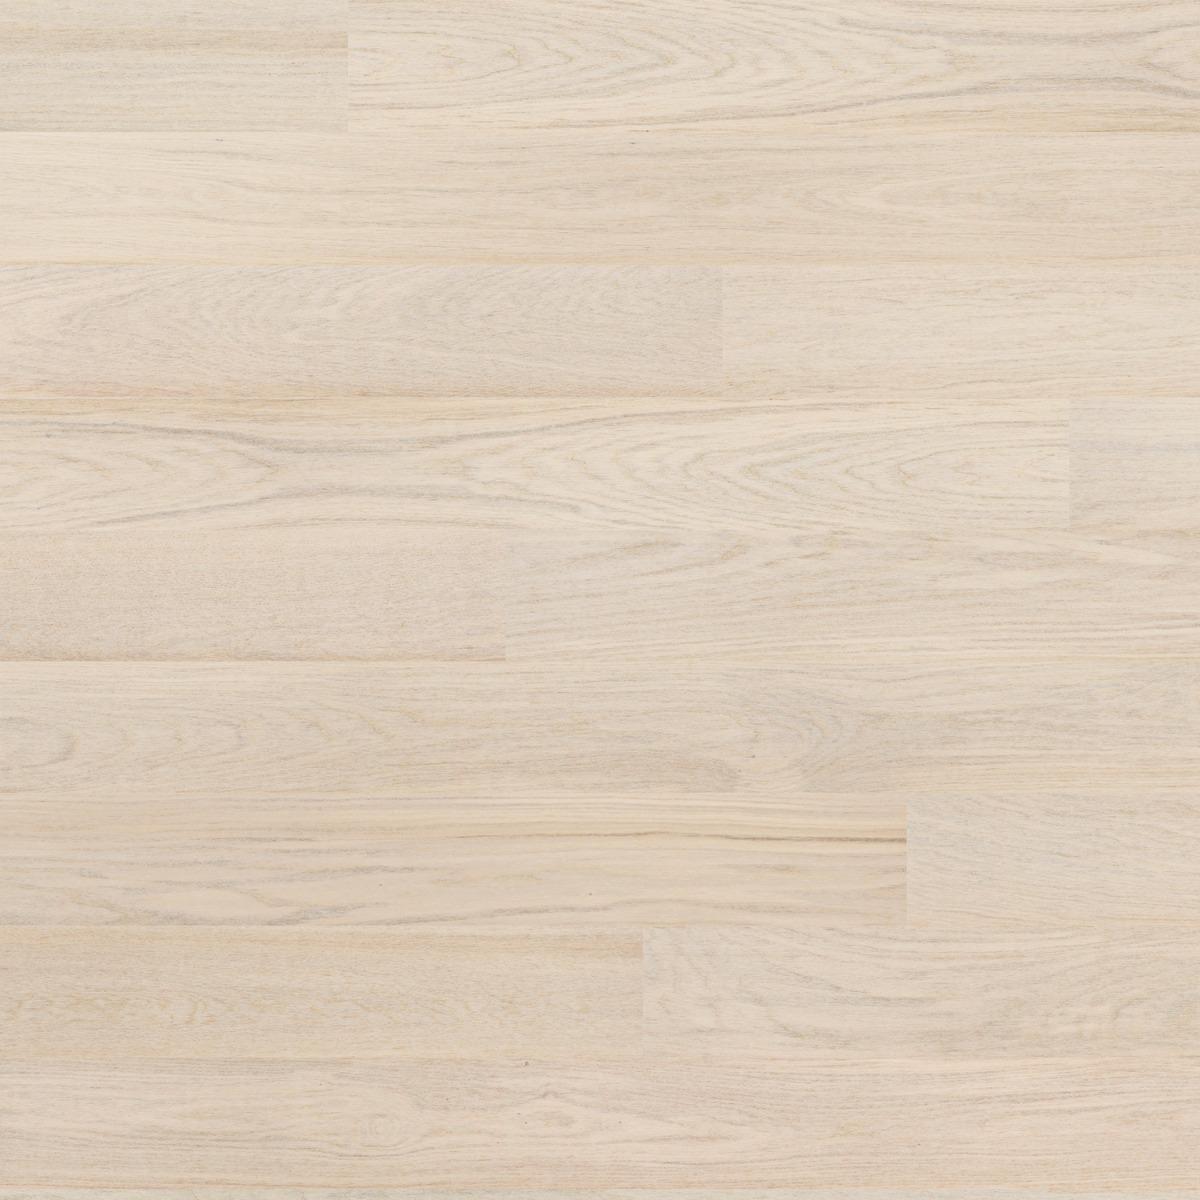 Tarkett Shade Ek Cotton White 1-Stav - Mattlack - Parkettgolv - 2200 MM - 14 MM